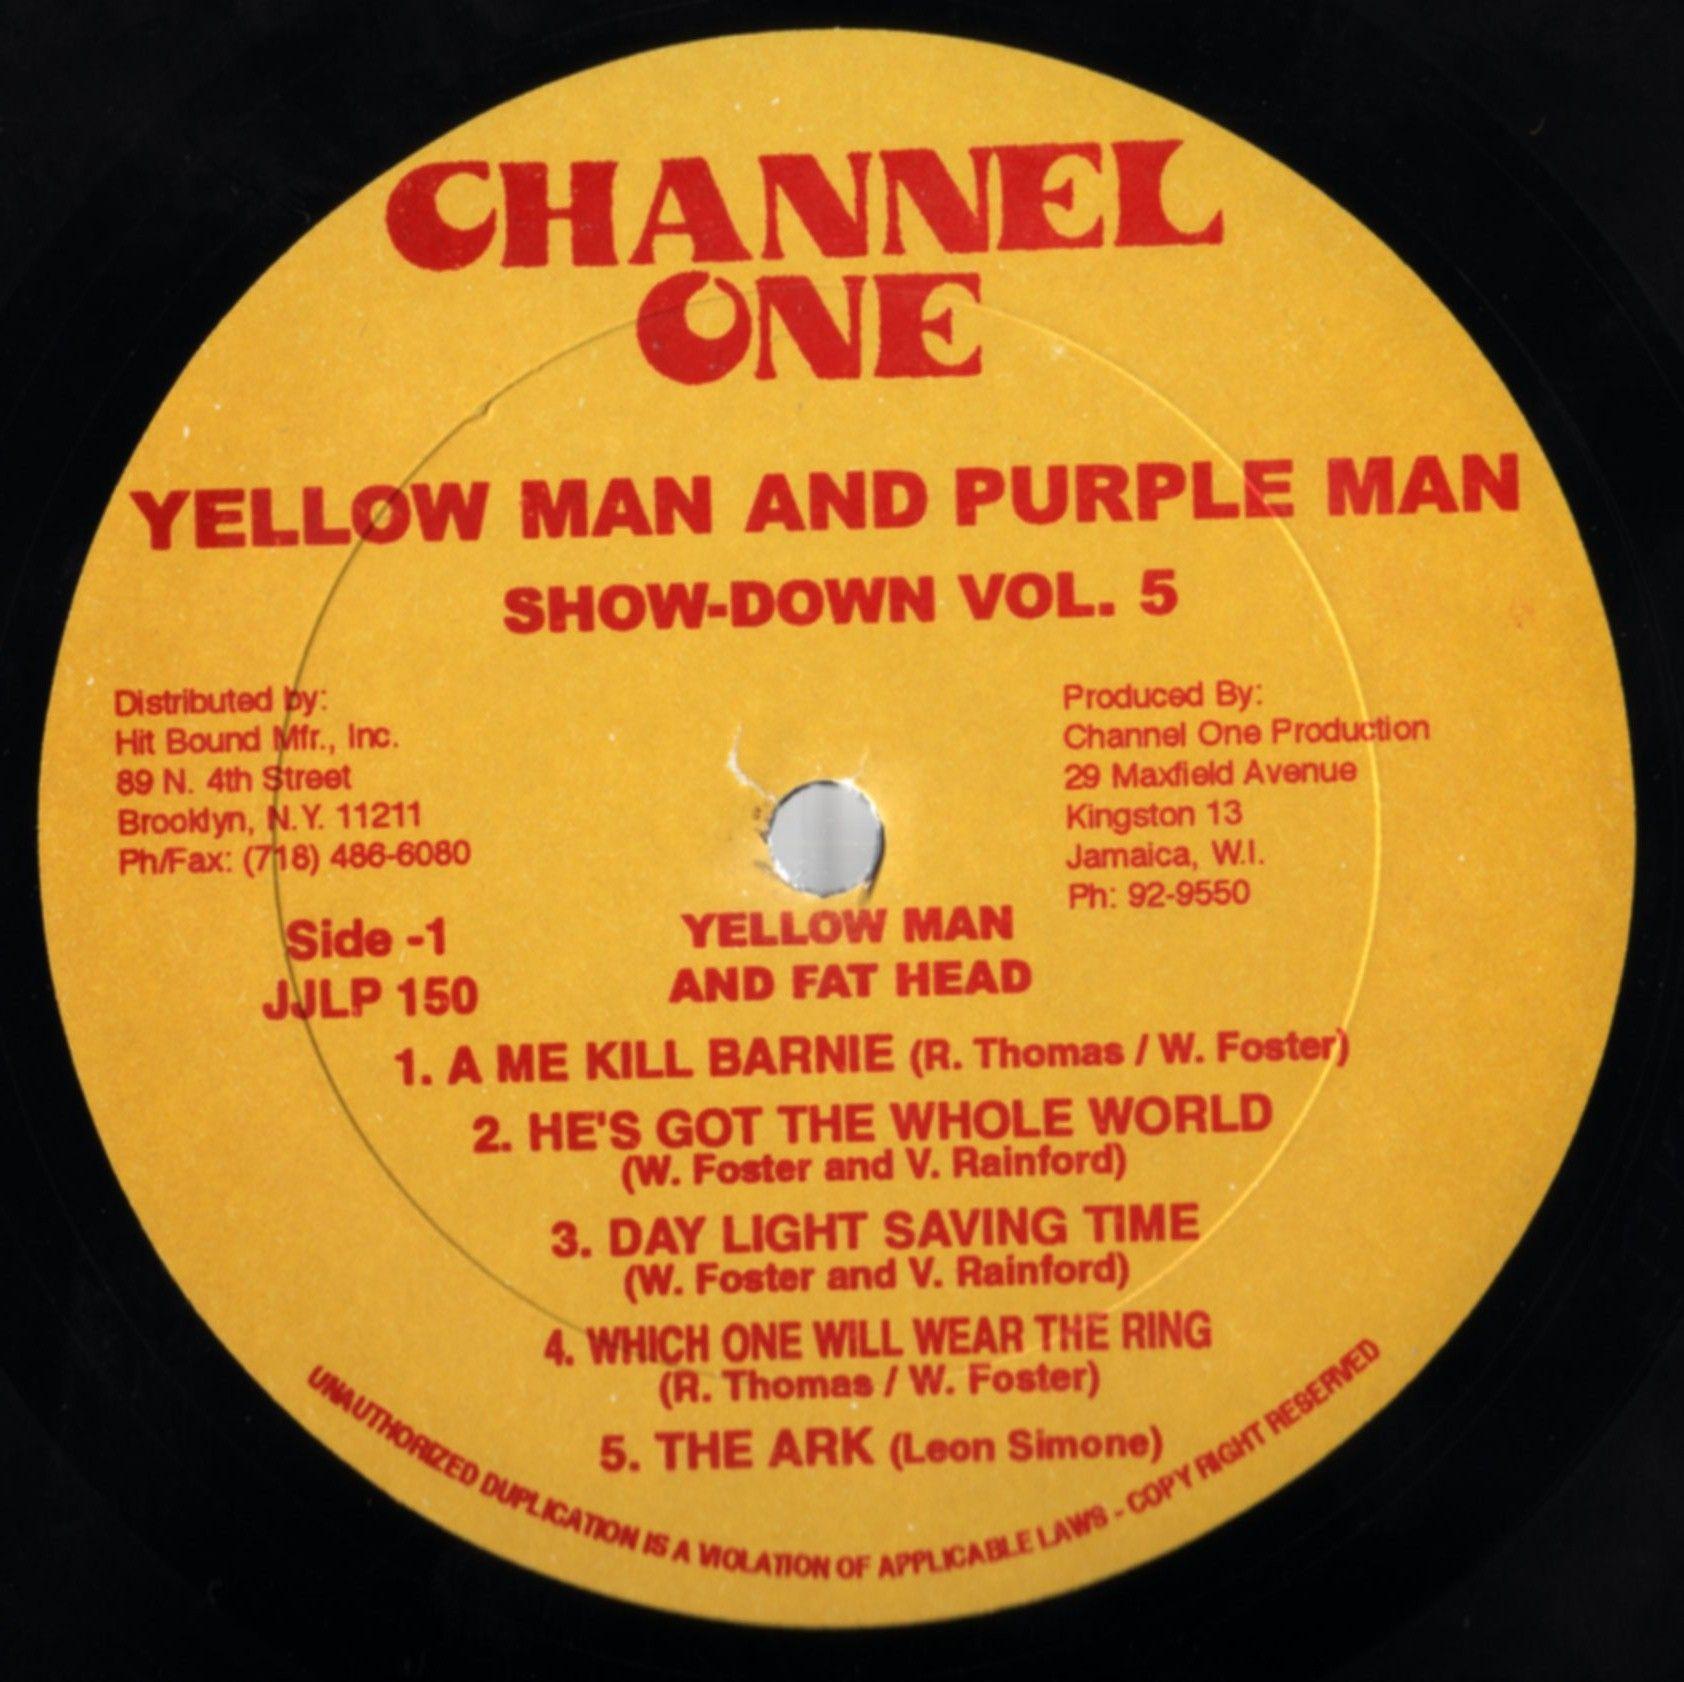 Yellowman & Purplemen - Show-Down Vol. 5 (Label)